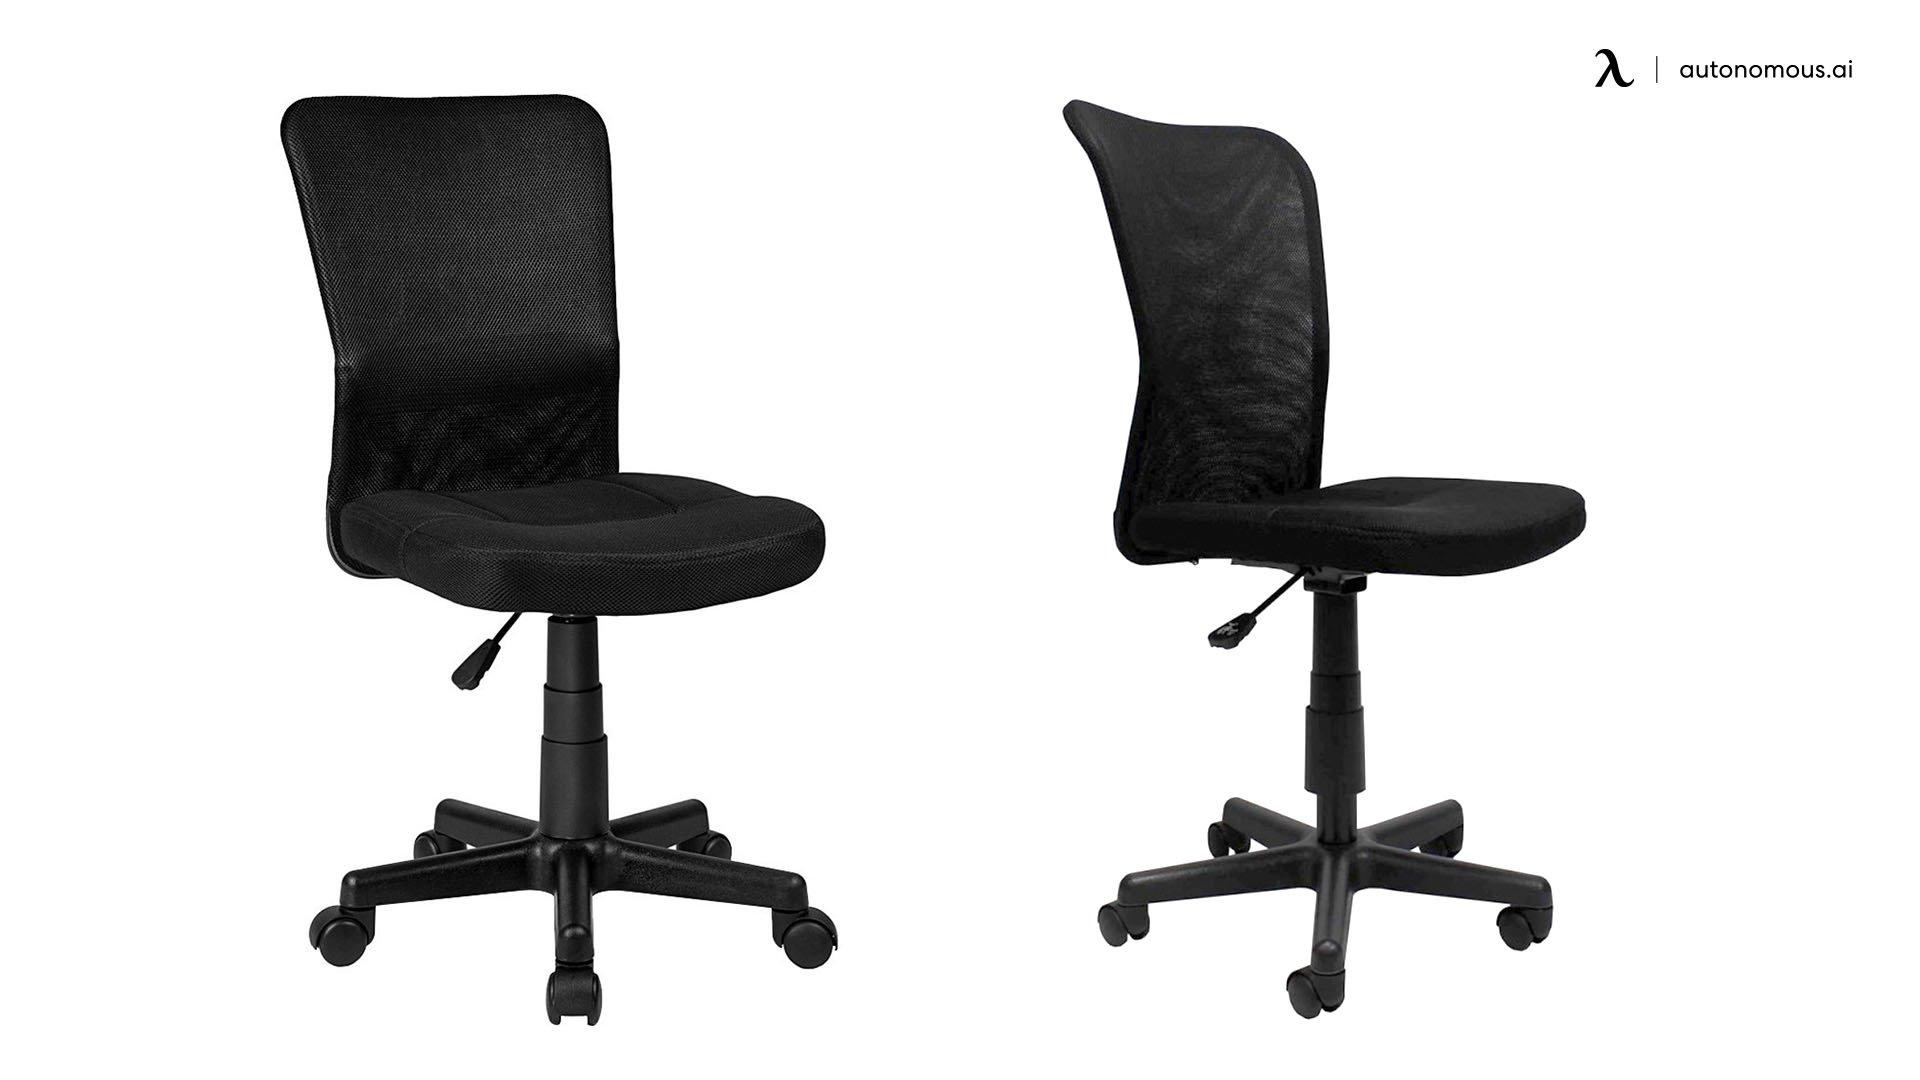 Black Ergonomic Chair Armless - TecTake